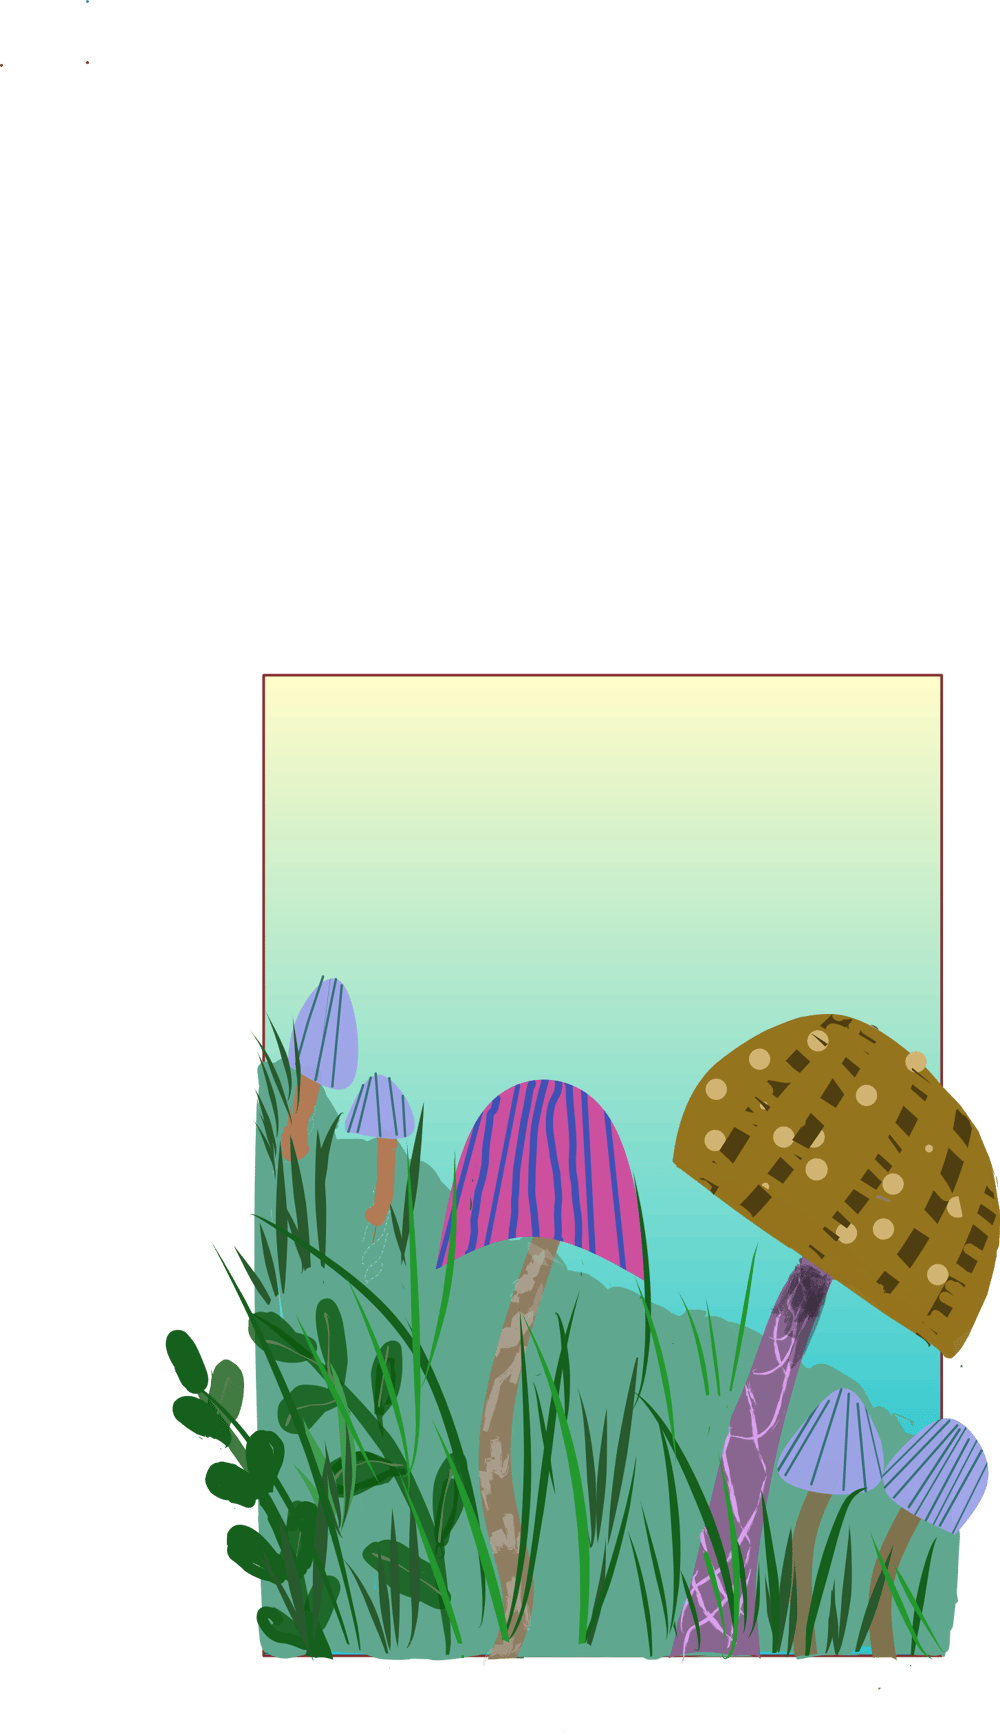 Mushrooms - 3 different ways (watercolor, pixel, vector) - image 3 - student project